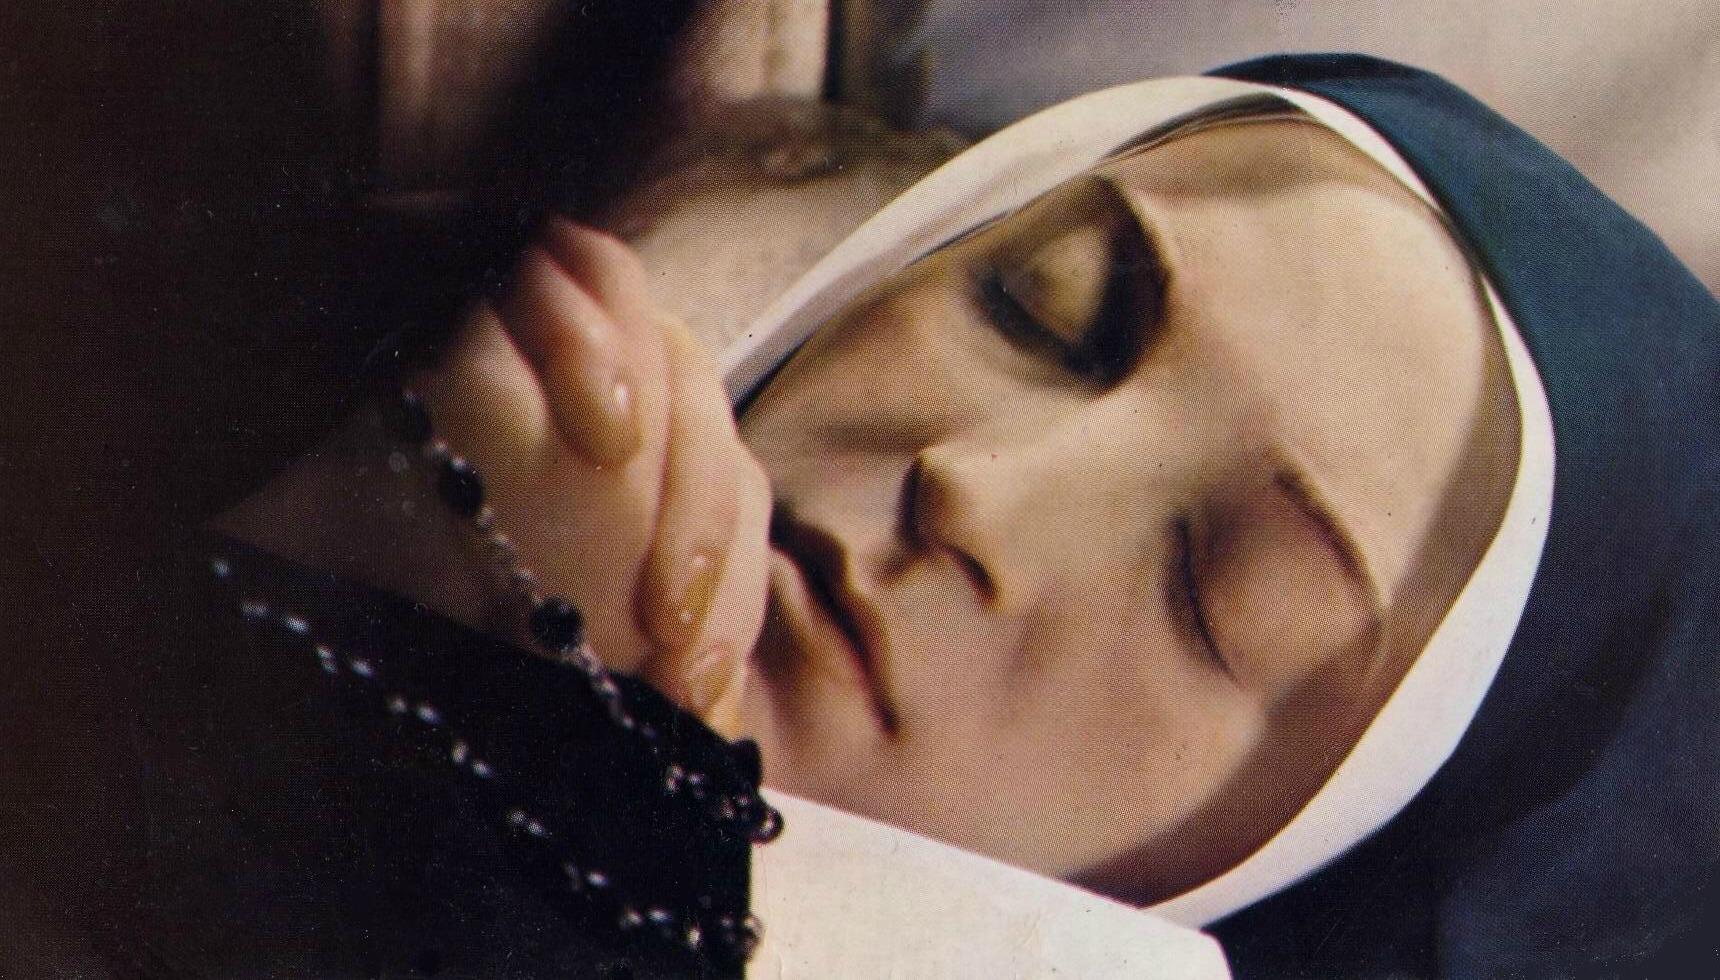 The Sleeping Saint of Nevers